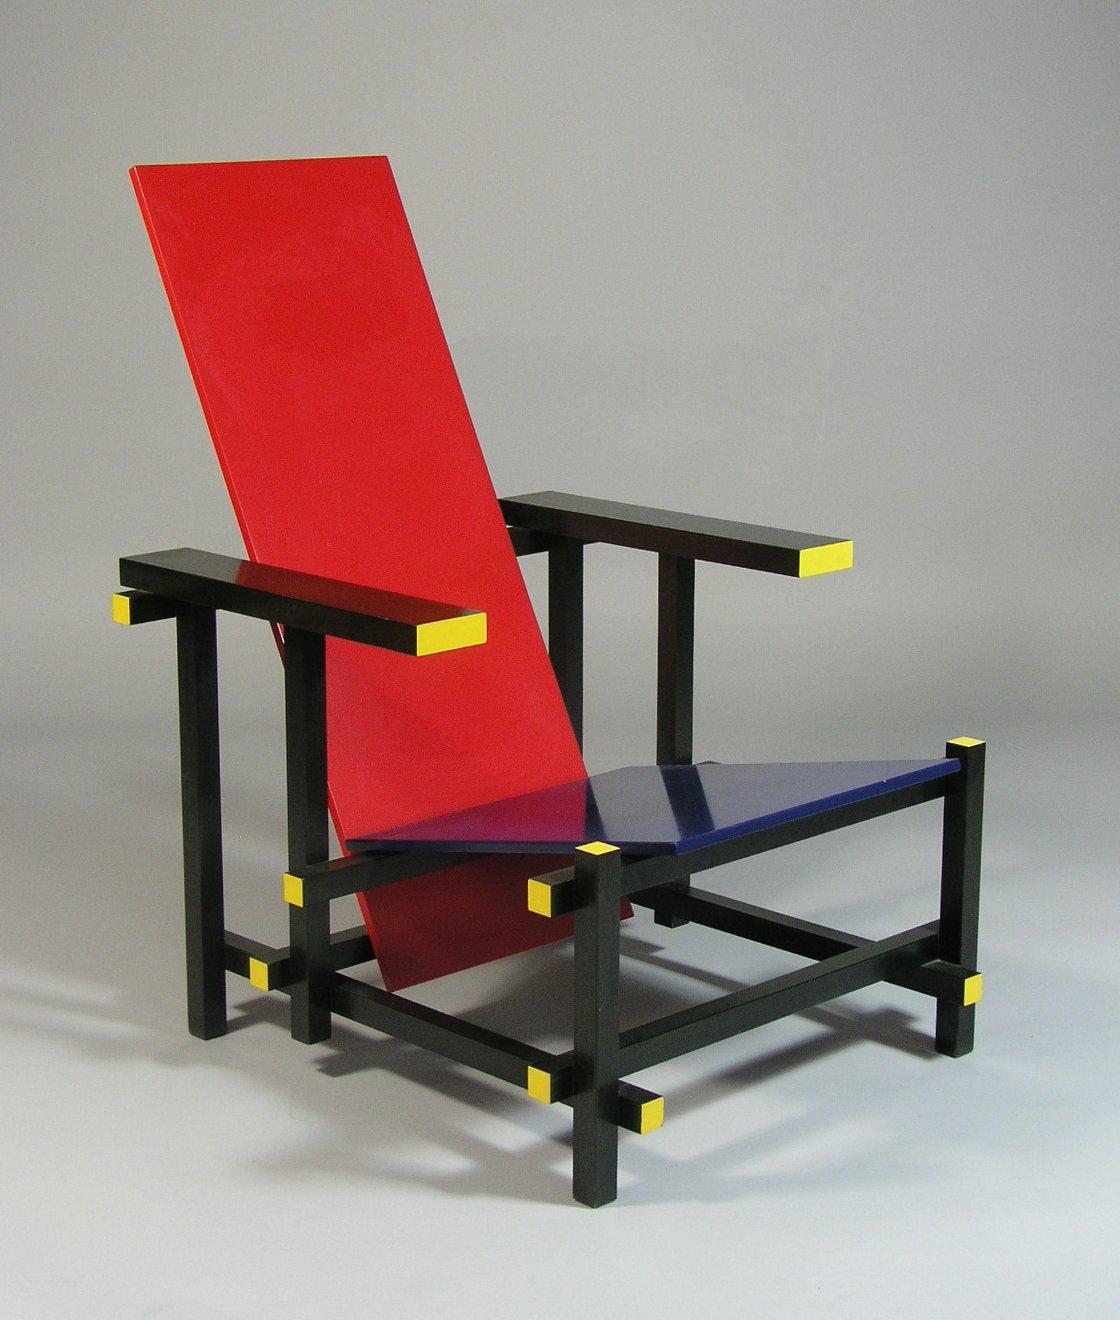 kleiner blauer stuhl m belideen. Black Bedroom Furniture Sets. Home Design Ideas